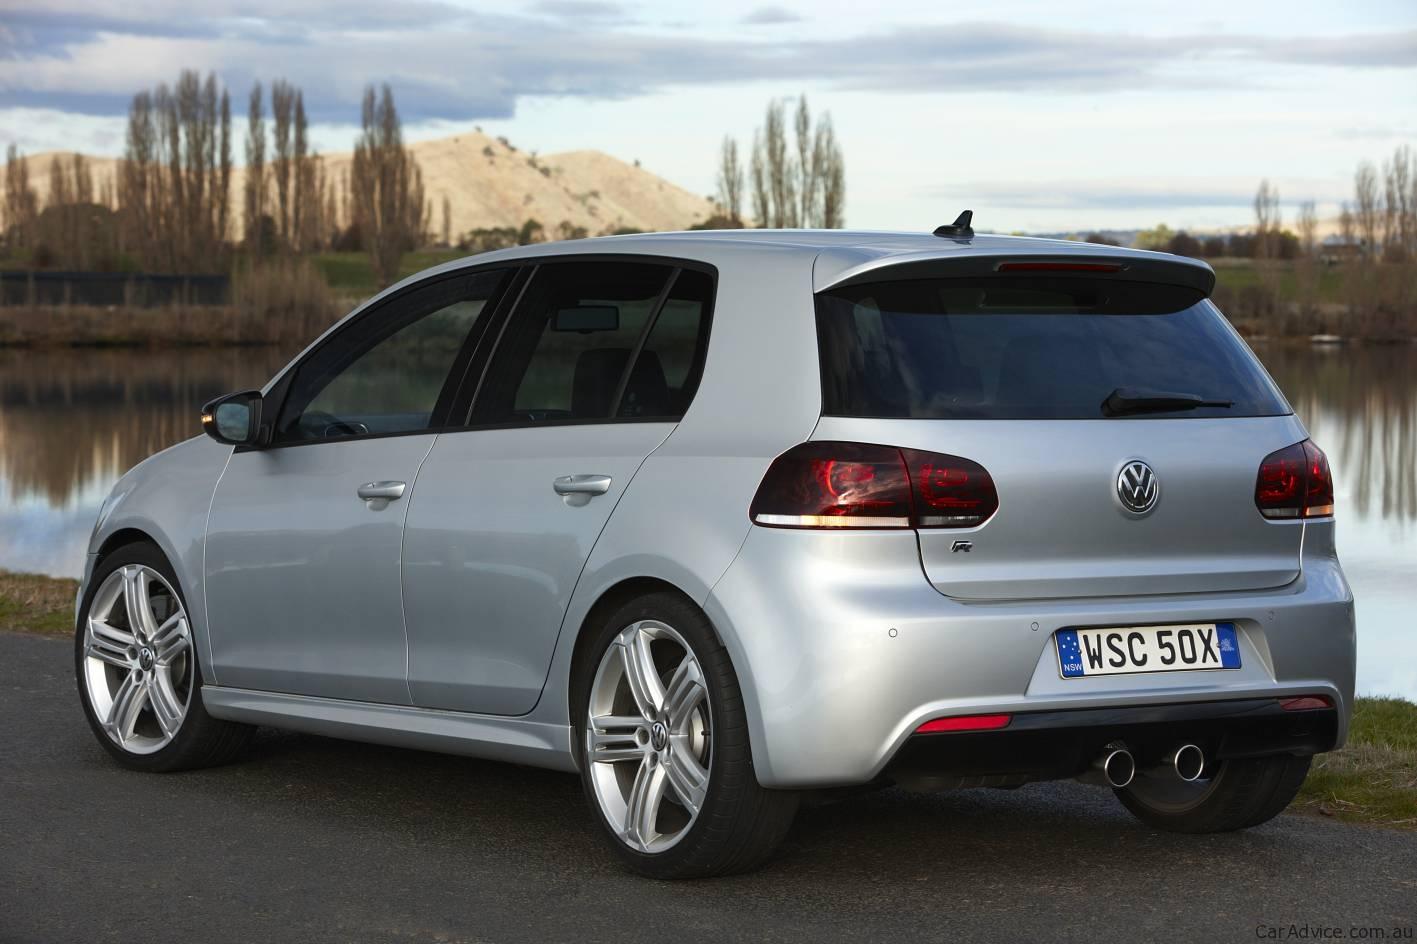 2010 Volkswagen Golf R launched in Australia - photos ...